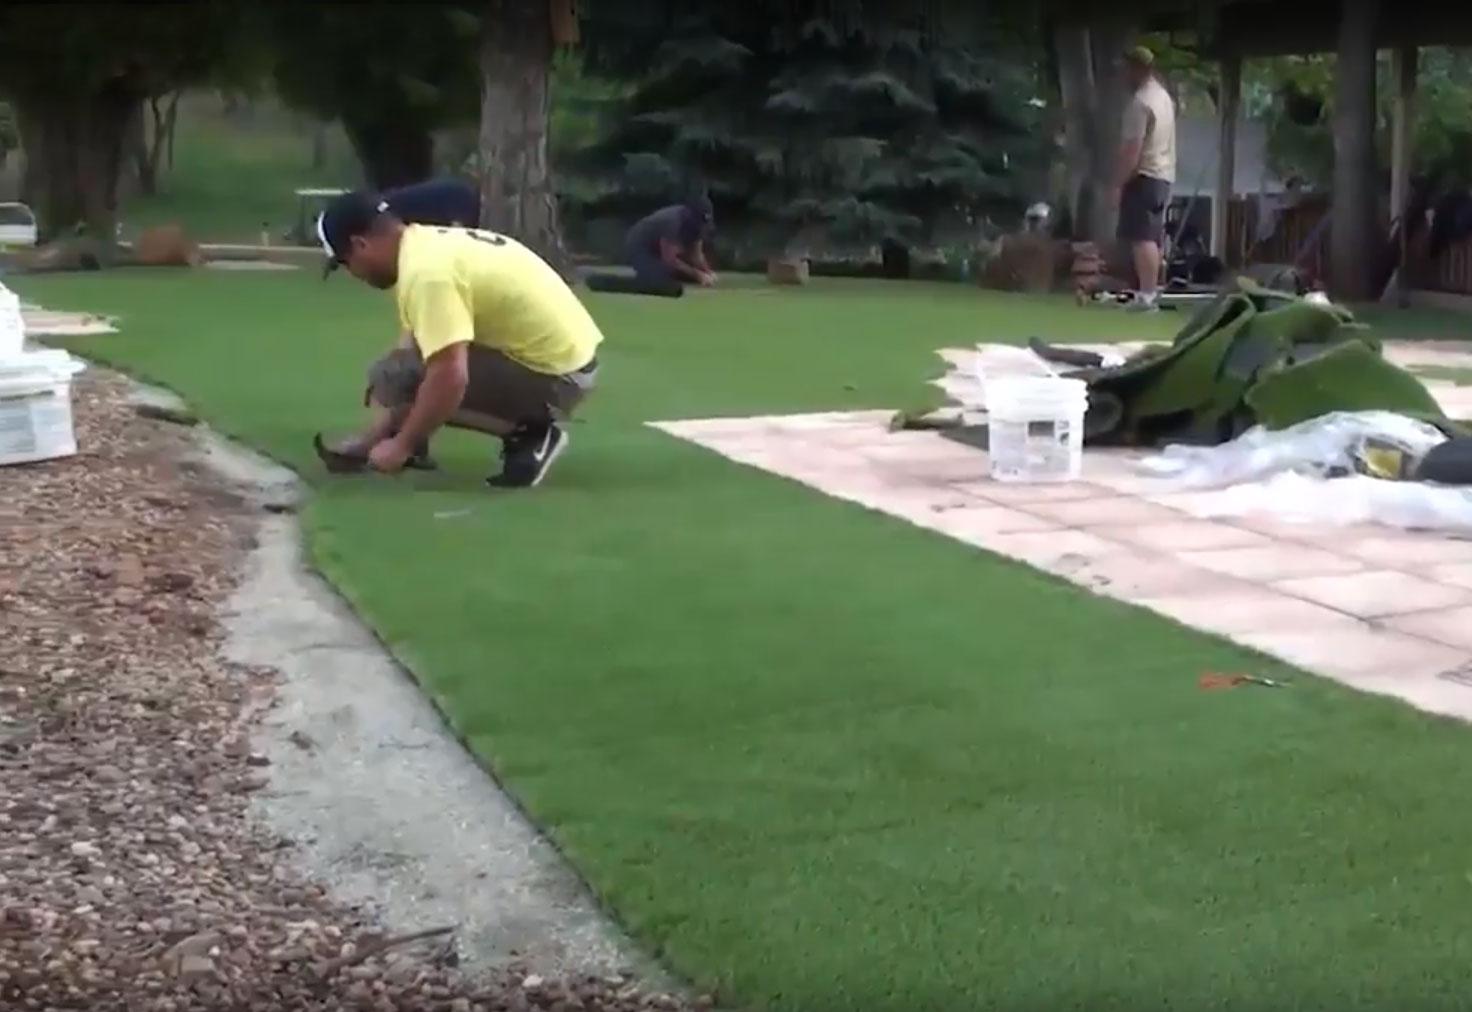 Artificial grass installation - nailing perimeter